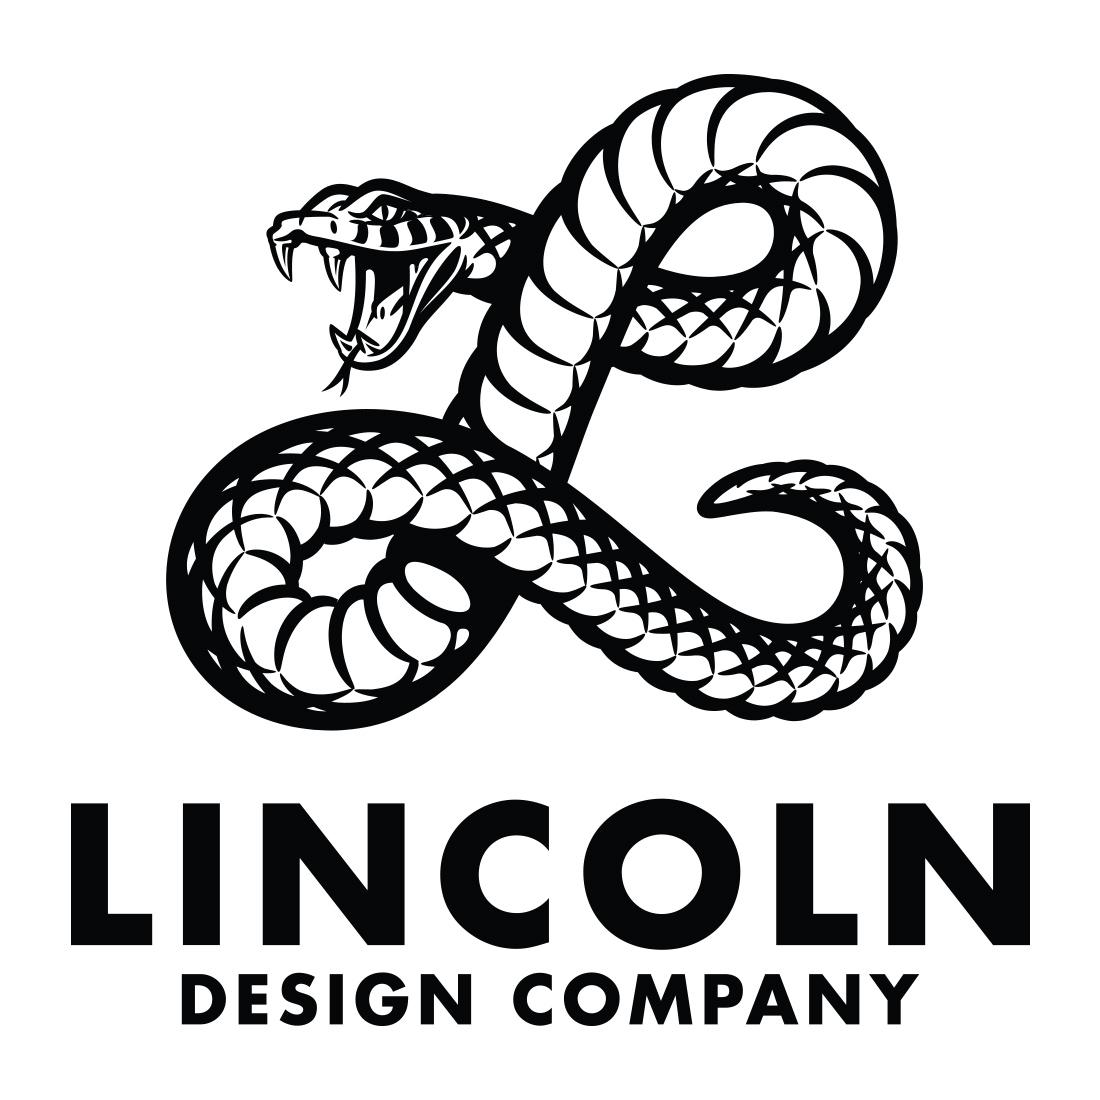 Lincoln Design Co on LogoLounge